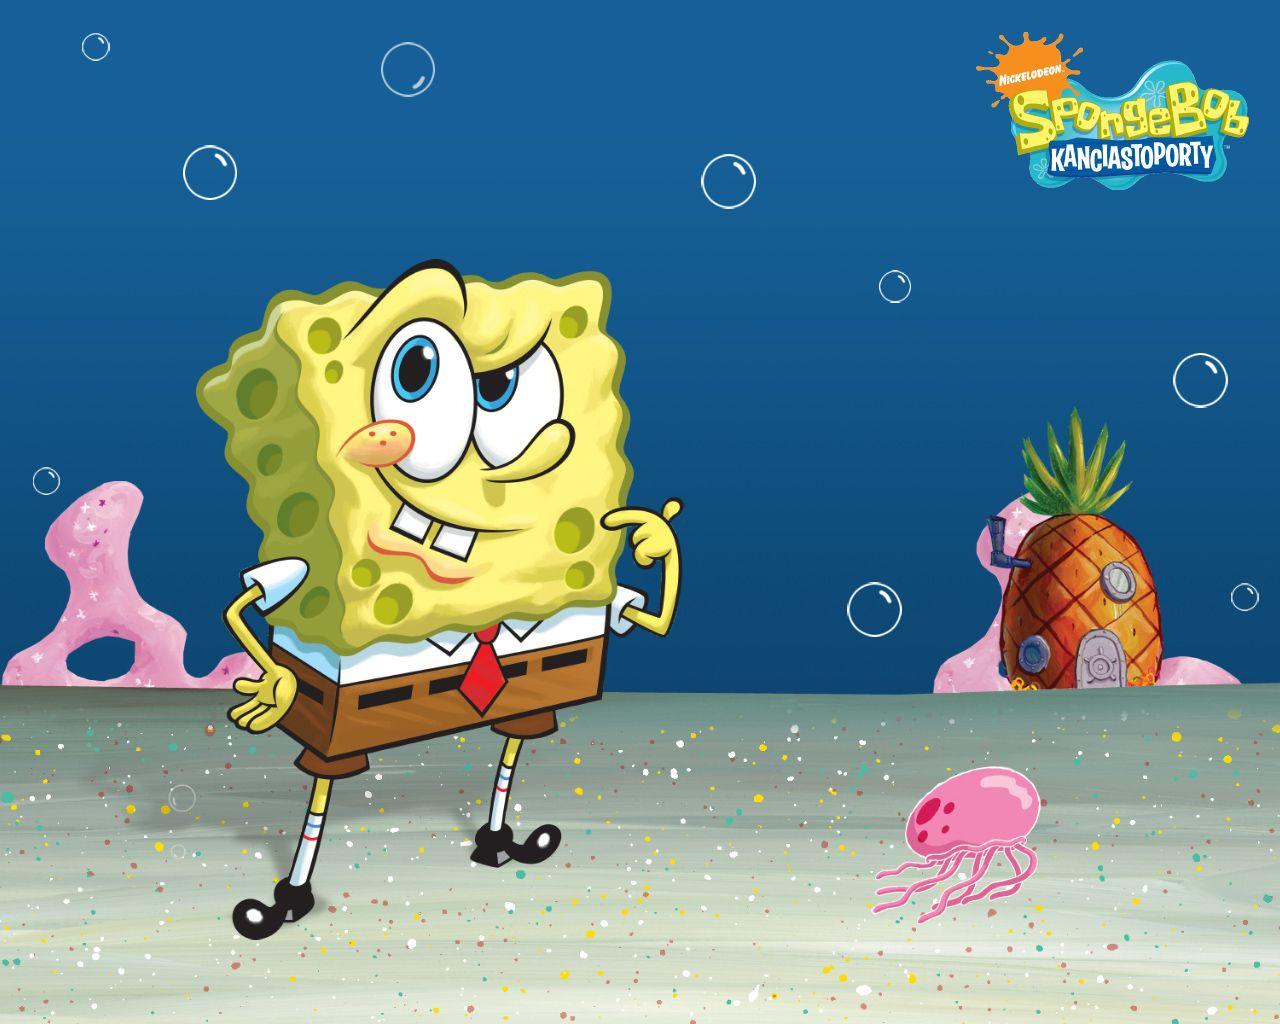 Spongebob Squarepants Wallpaper Spongebob Spongebob Wallpaper Spongebob Spongebob Squarepants